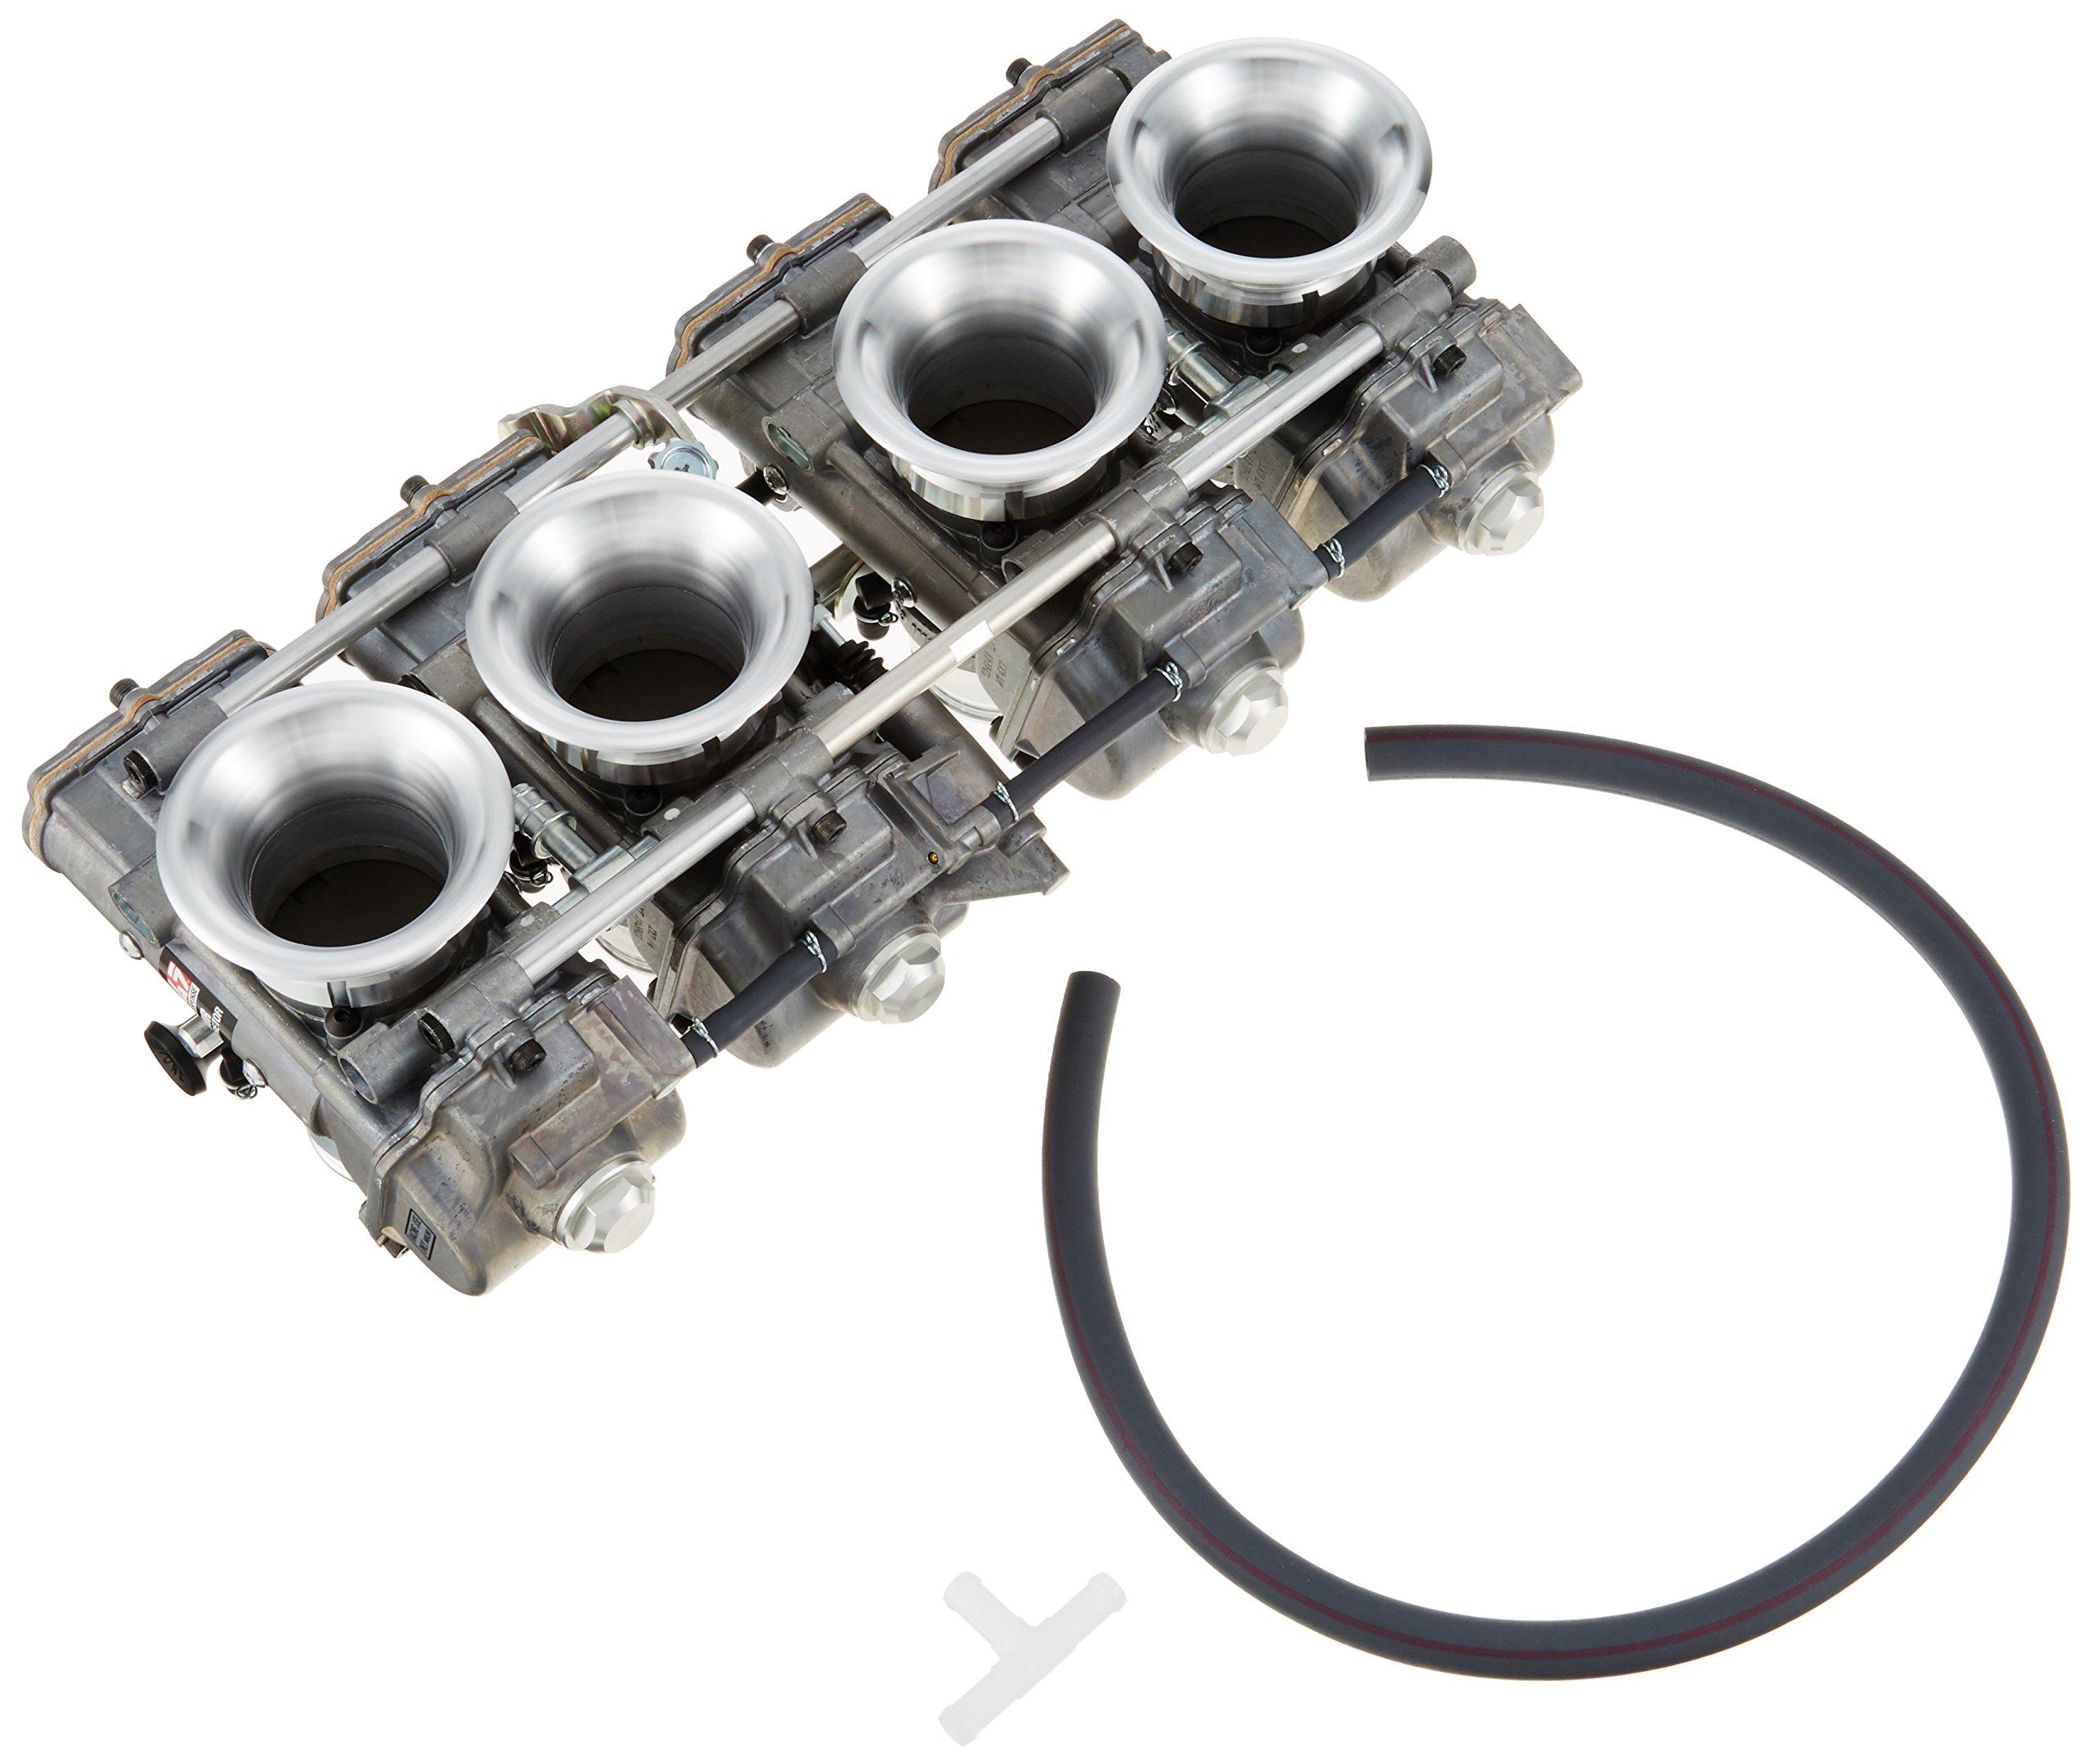 Yoshimura Mikuni TMR41 carburetor funnel specification Center link CB1300SF [SC40] (-99) X-4 (-99) 775-415-1100 by Yoshimura Japan (Image #3)